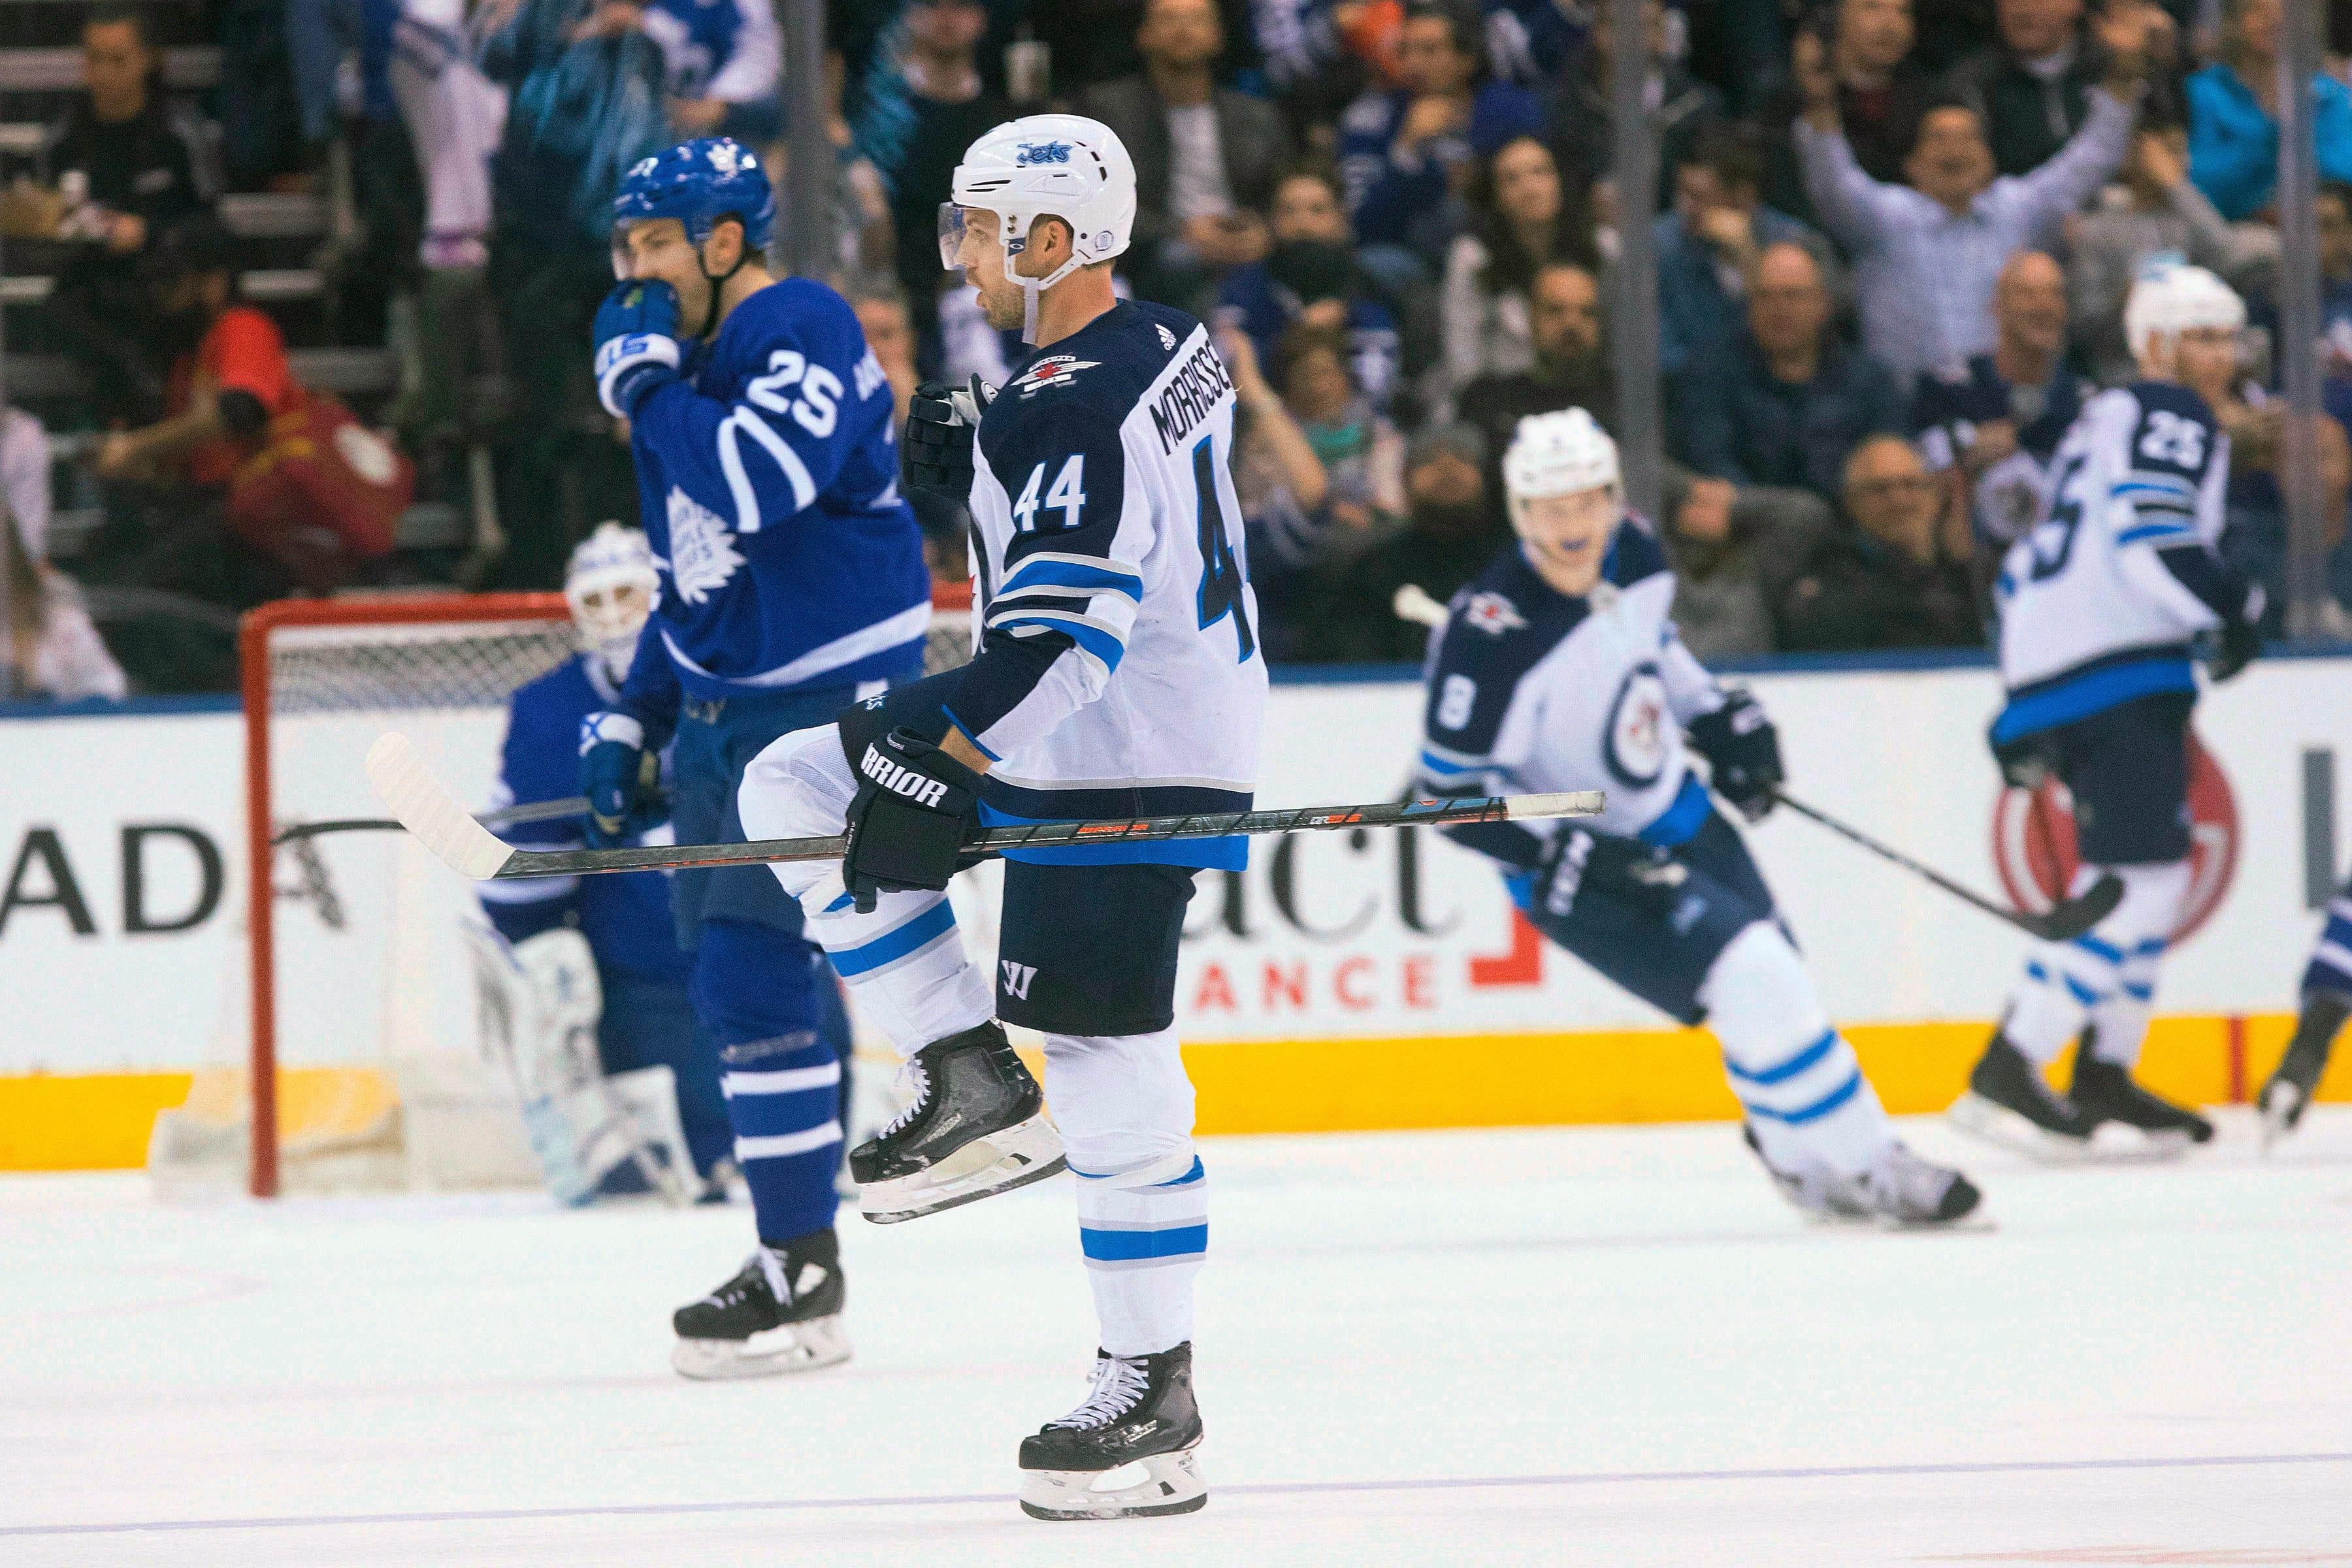 Morrissey, Byfuglien lead Jets past Maple Leafs, 3-1